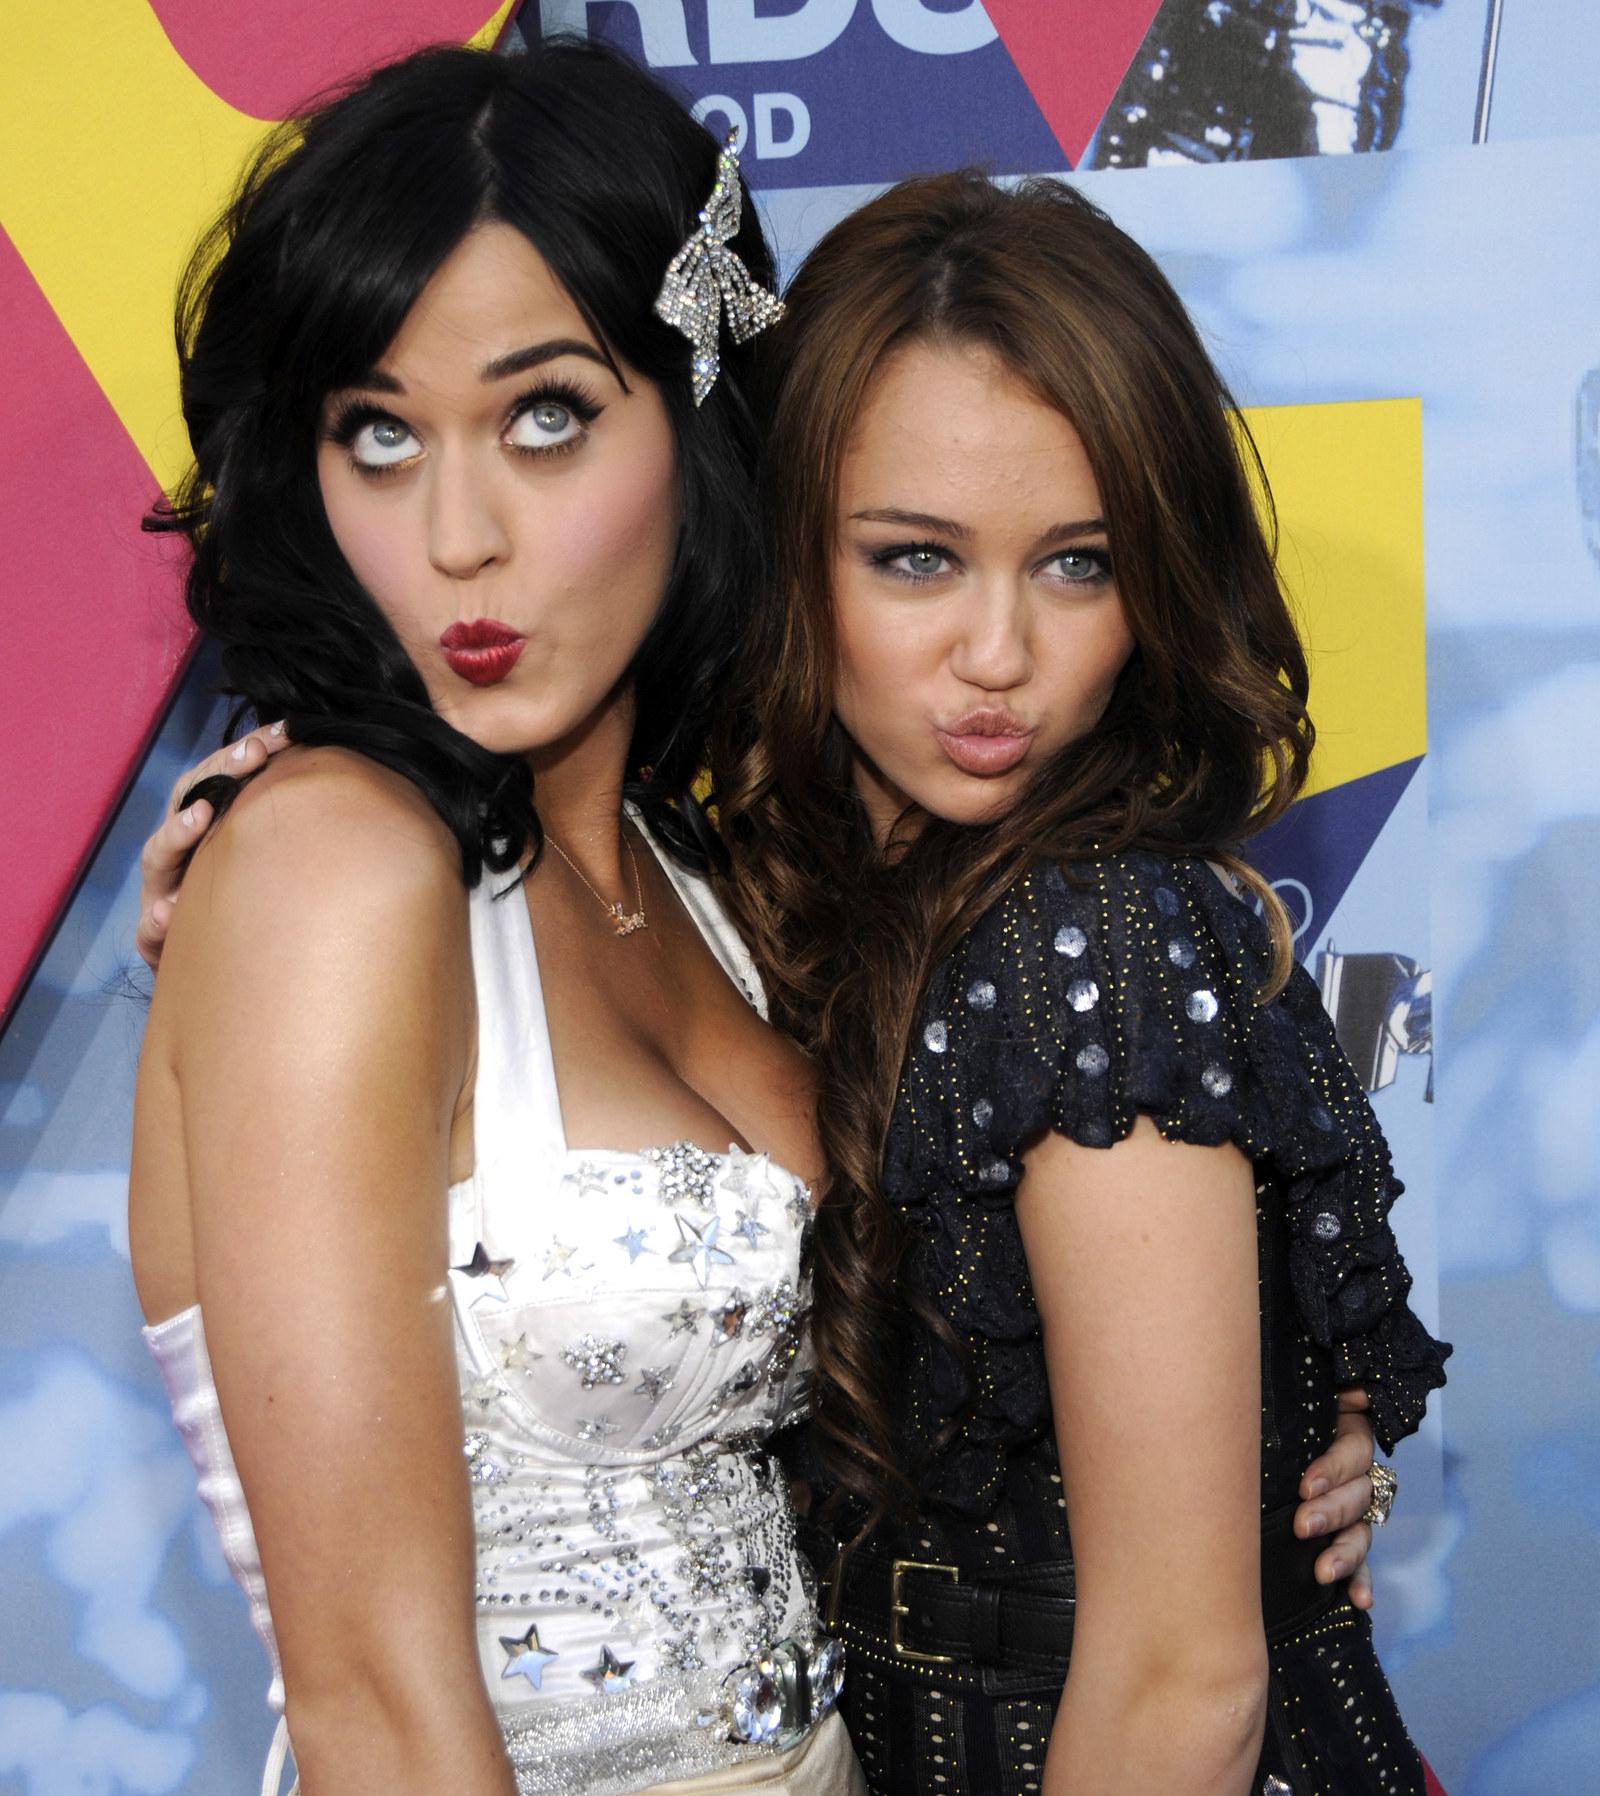 Miley kissed a girl virgin hairy